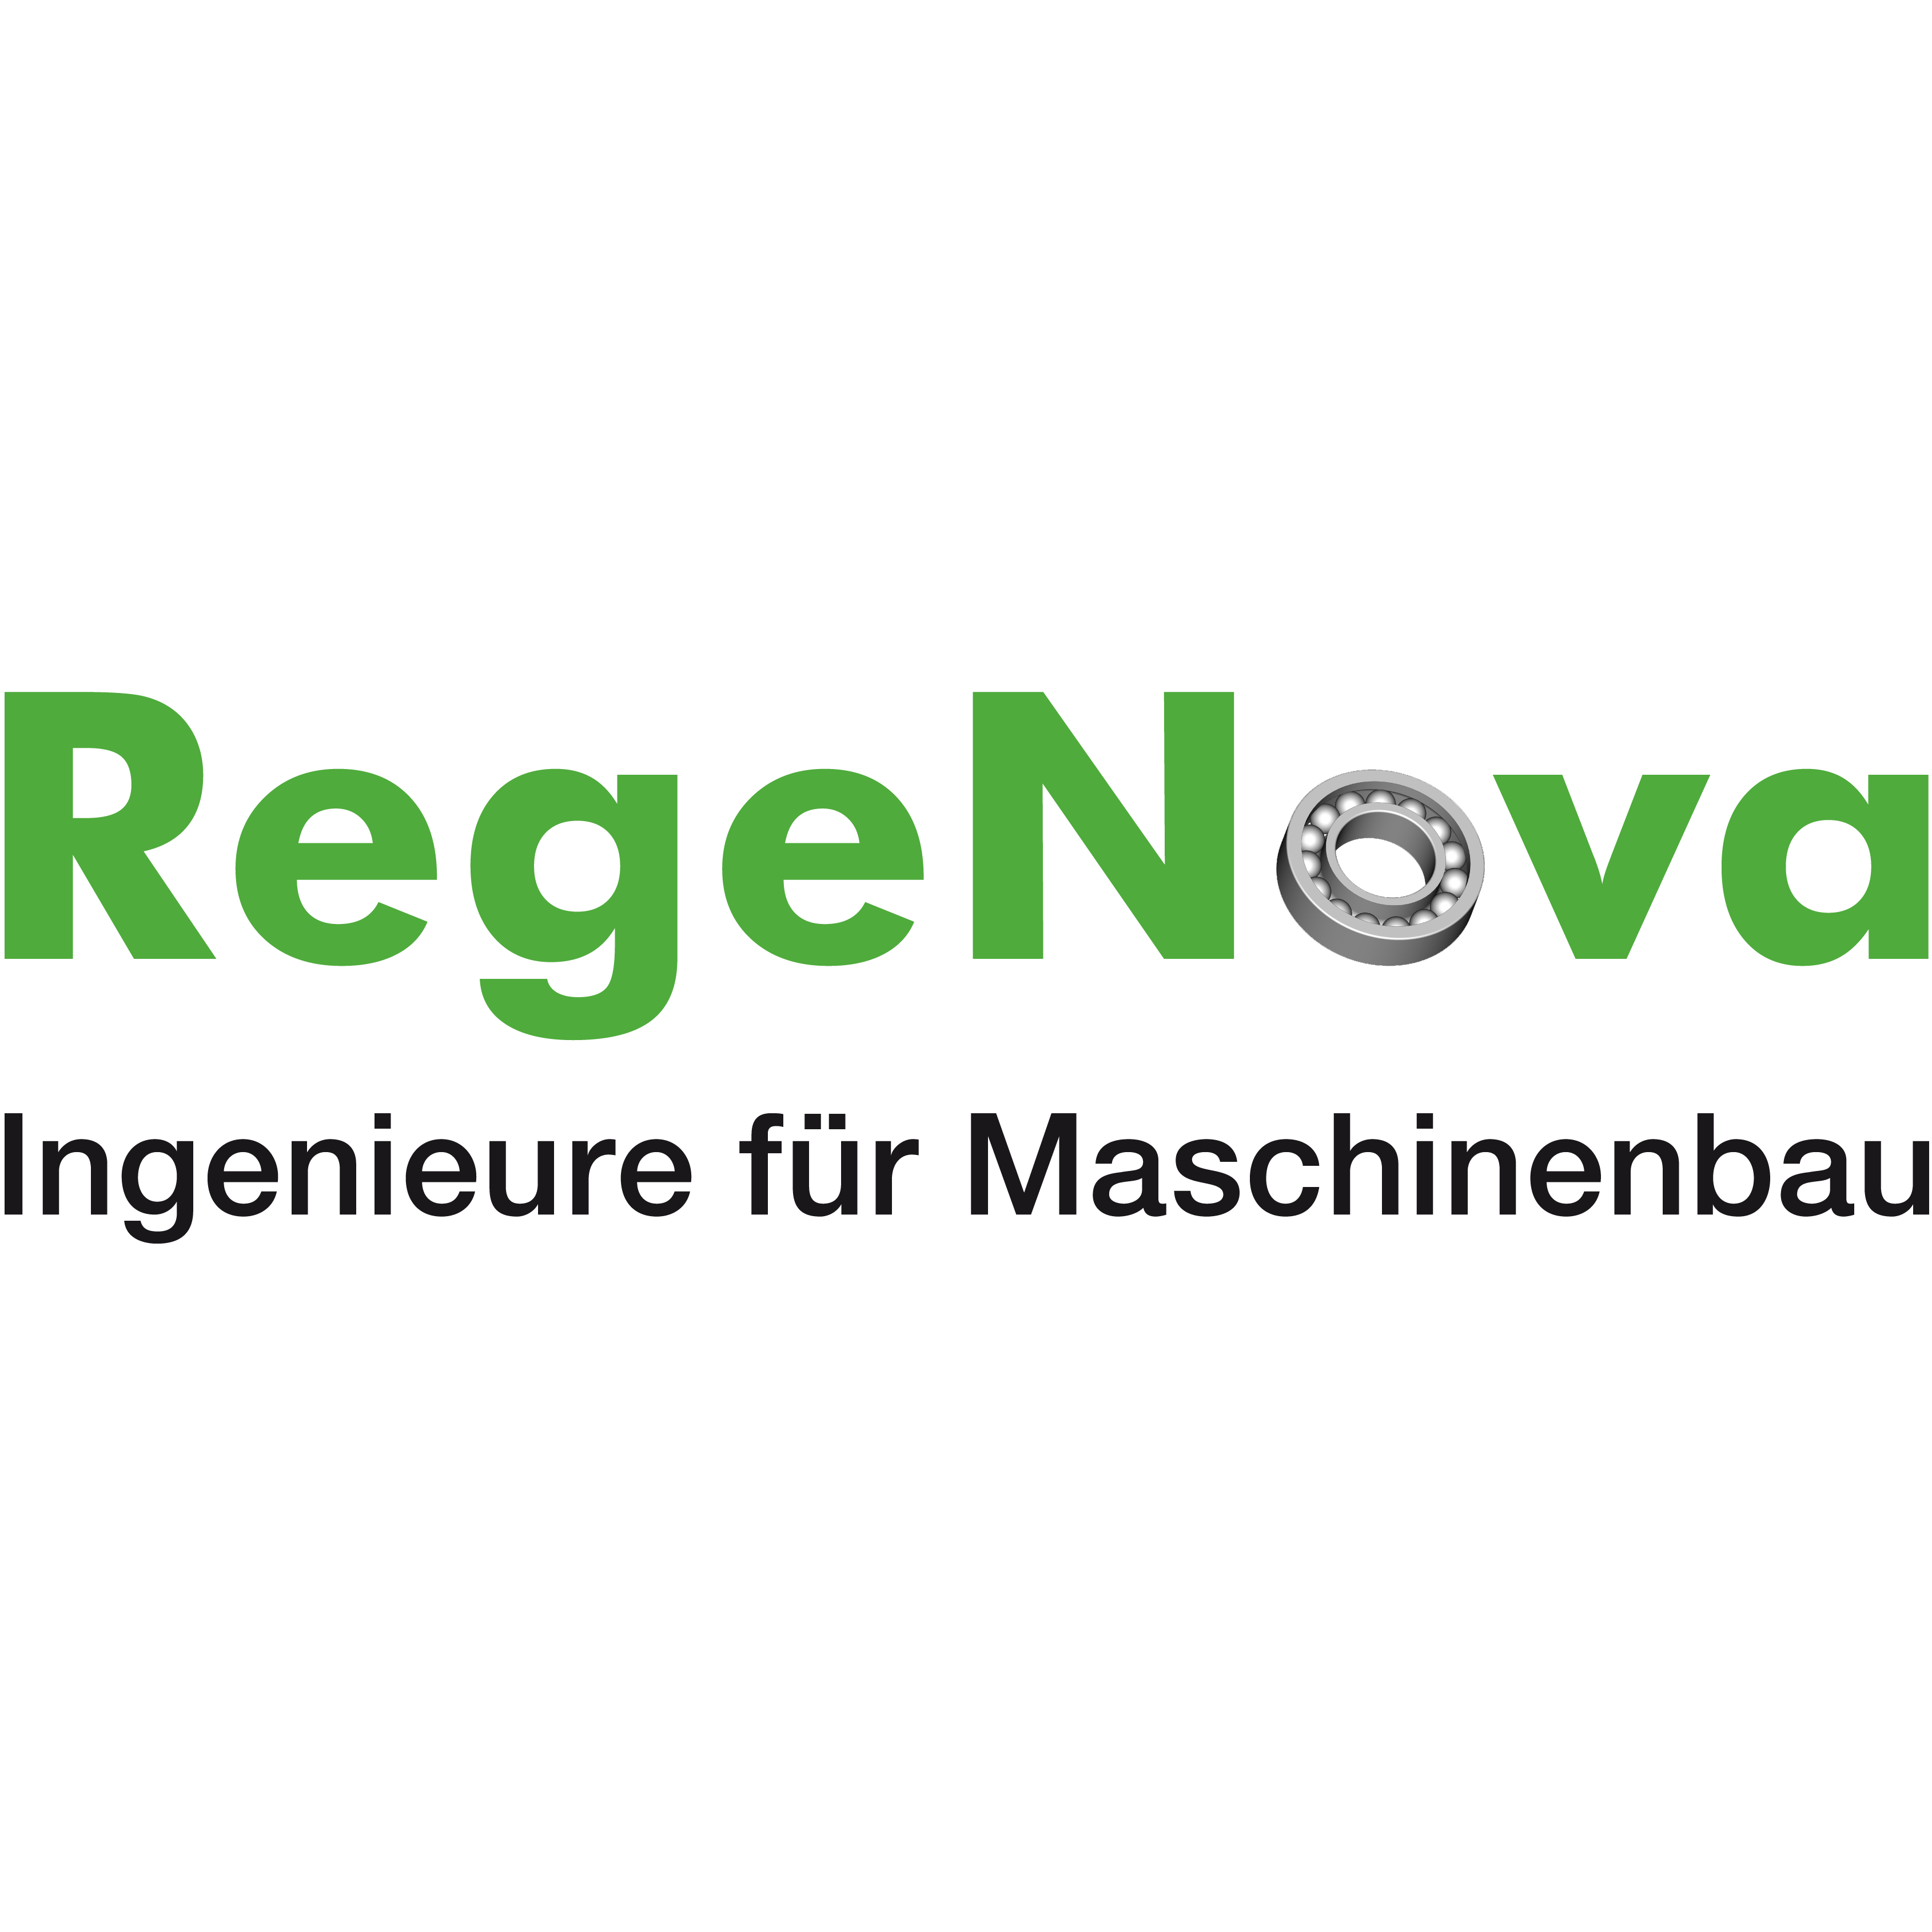 Ingenieur in rhede statik for Maschinenbau statik